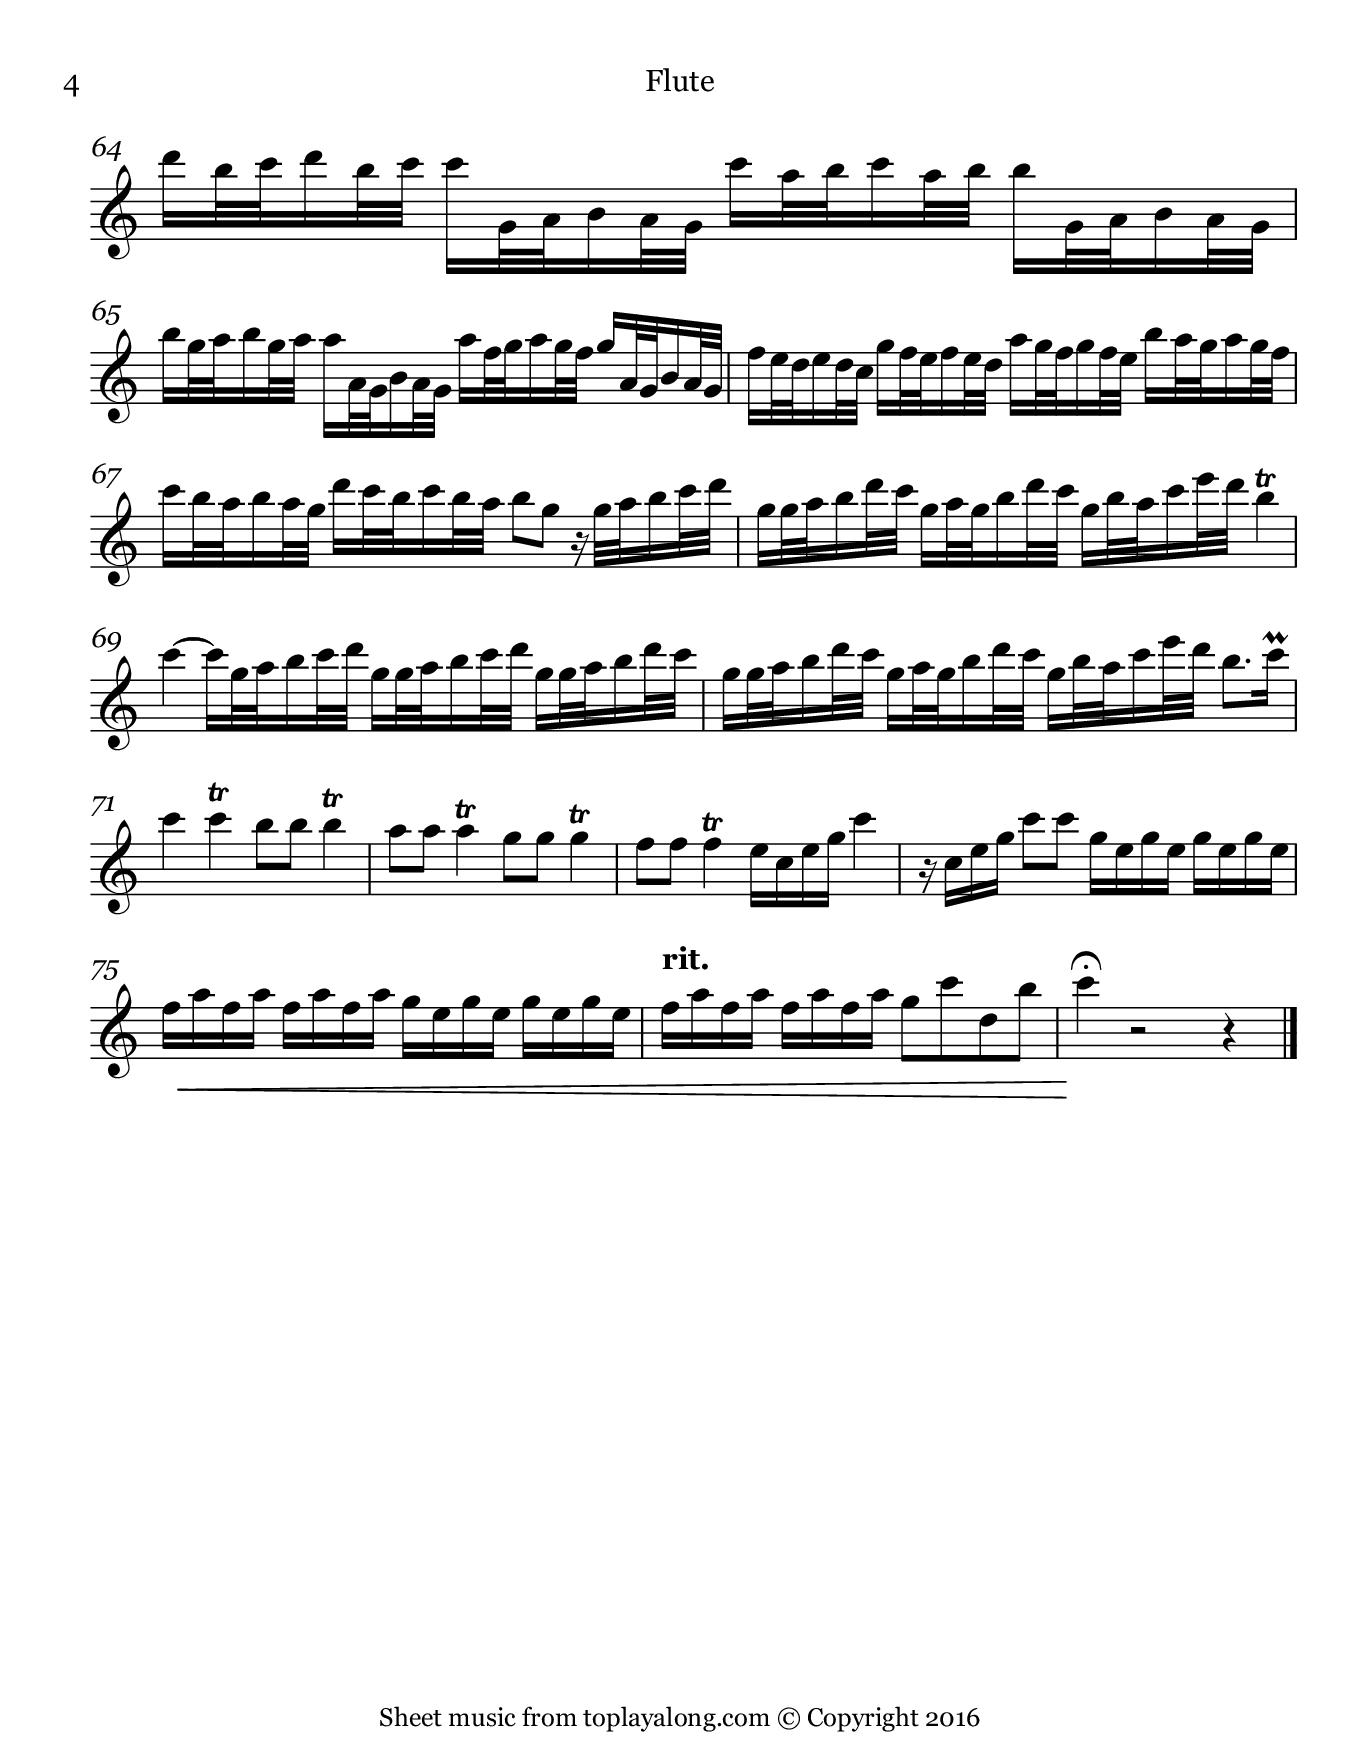 Flautino Concerto in C major RV 443 (III. Allegro molto) by Vivaldi. Sheet music for Flute, page 4.